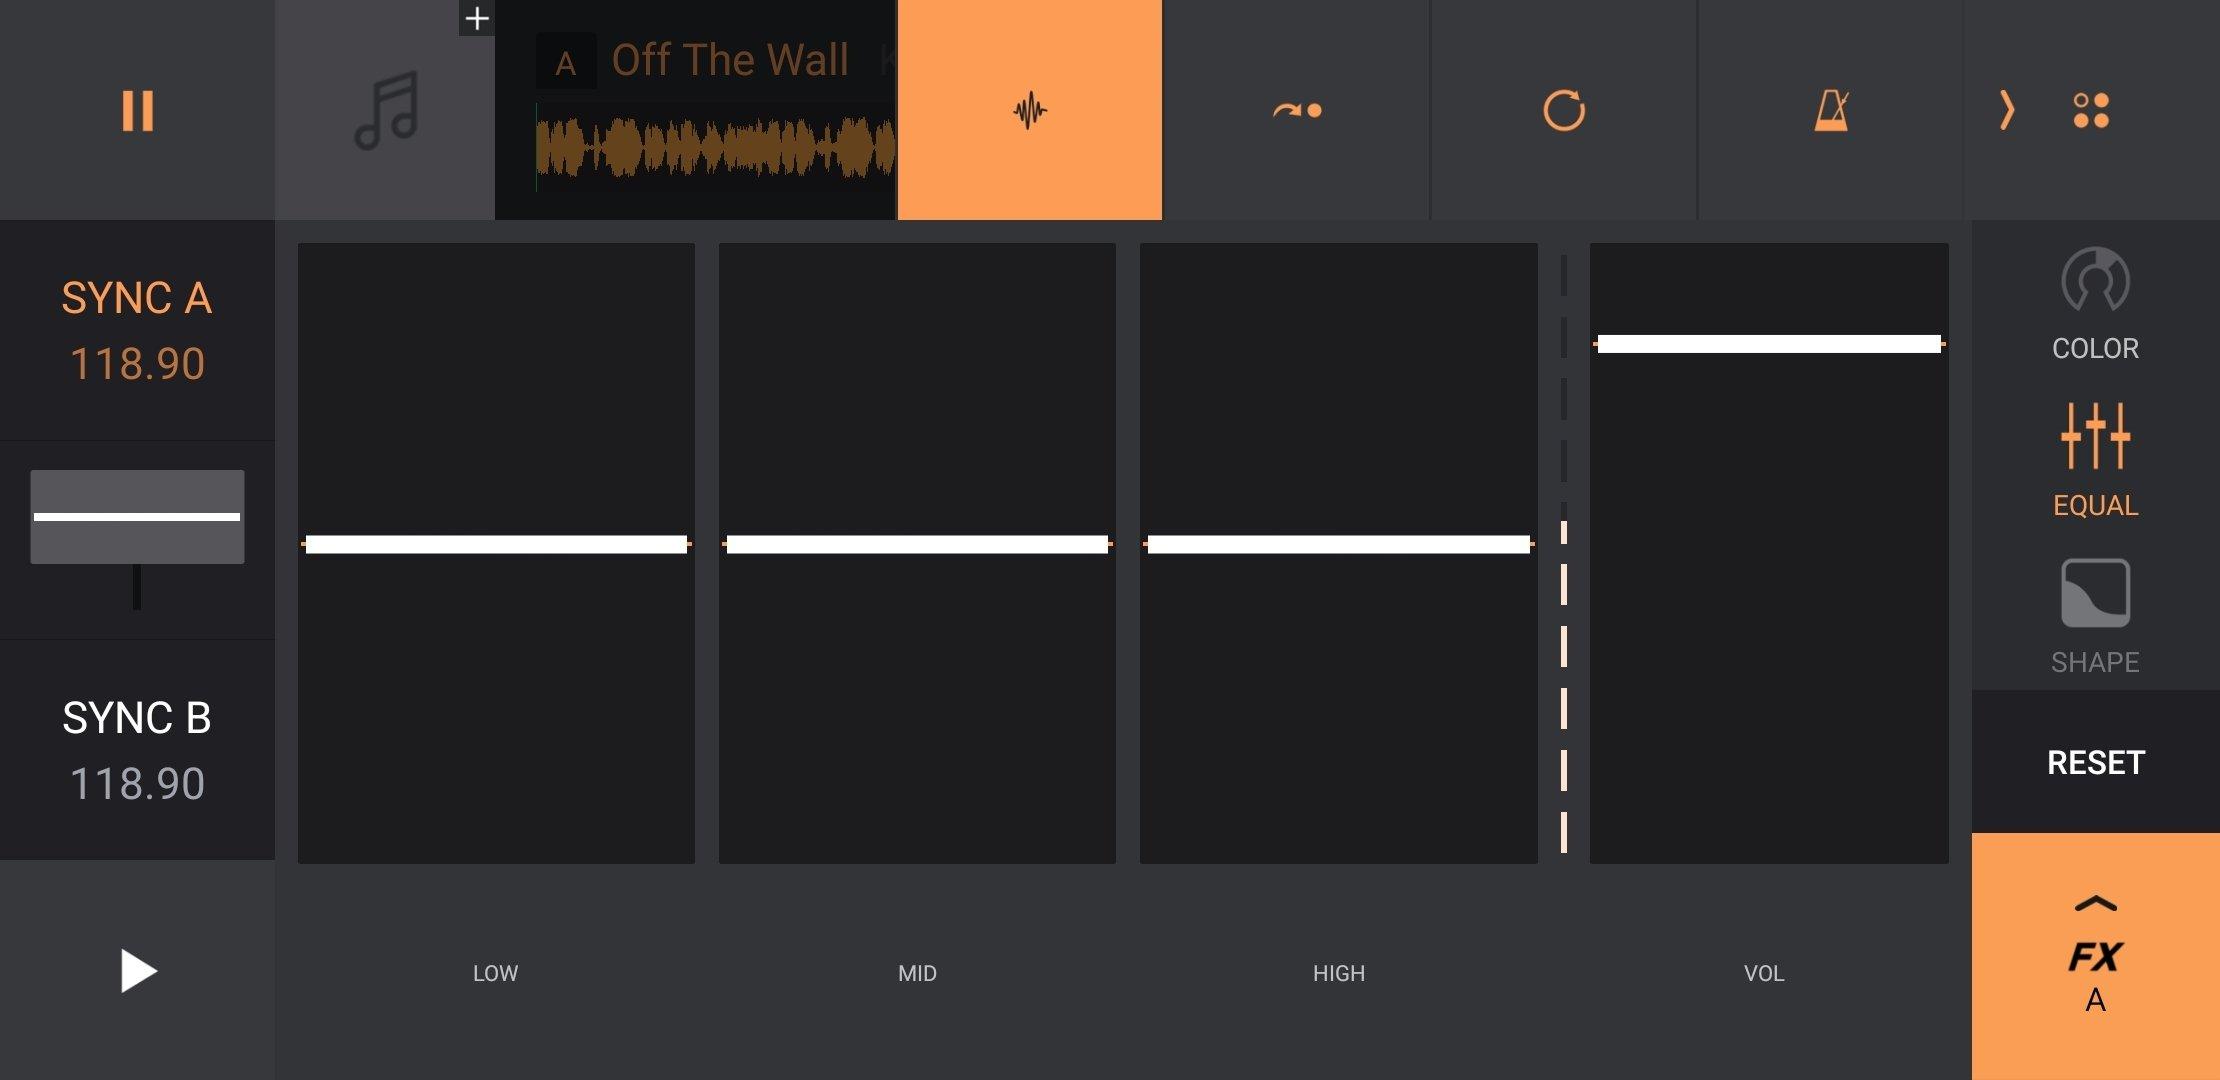 dj mixer apk full version